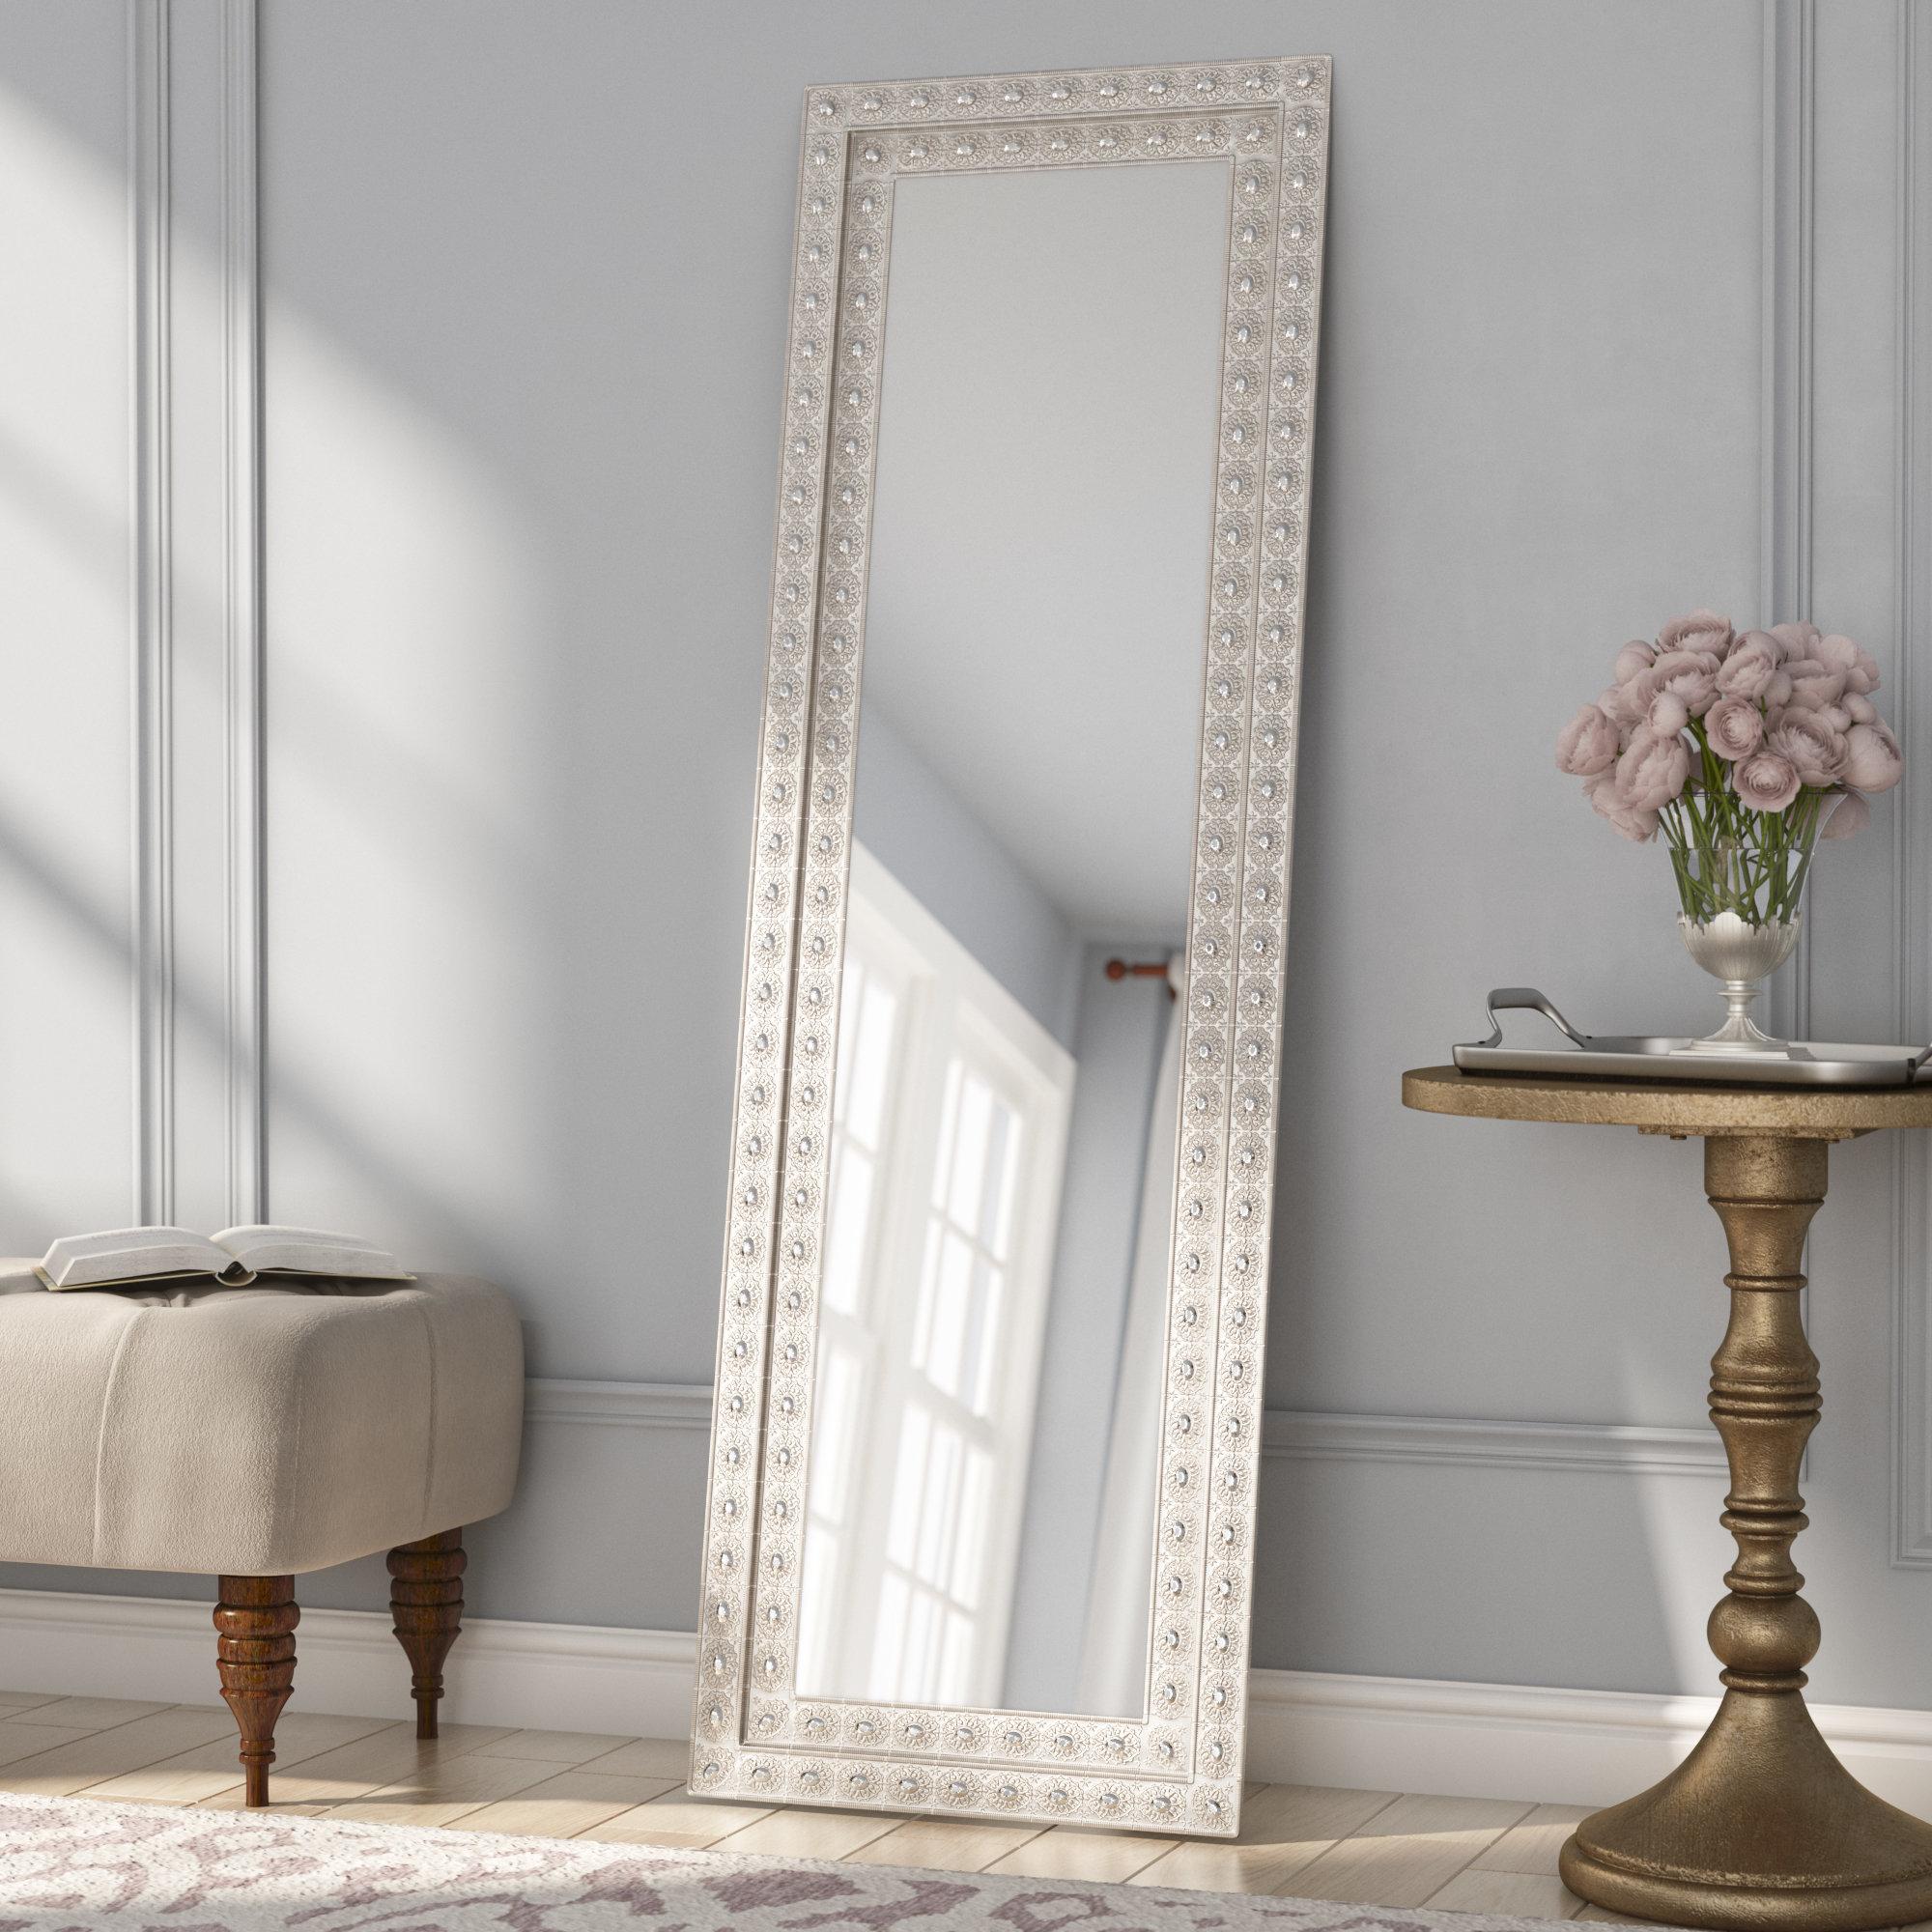 Willa Arlo Interiors Sveta Traditional Full Length Mirror Inside Handcrafted Farmhouse Full Length Mirrors (Image 20 of 20)